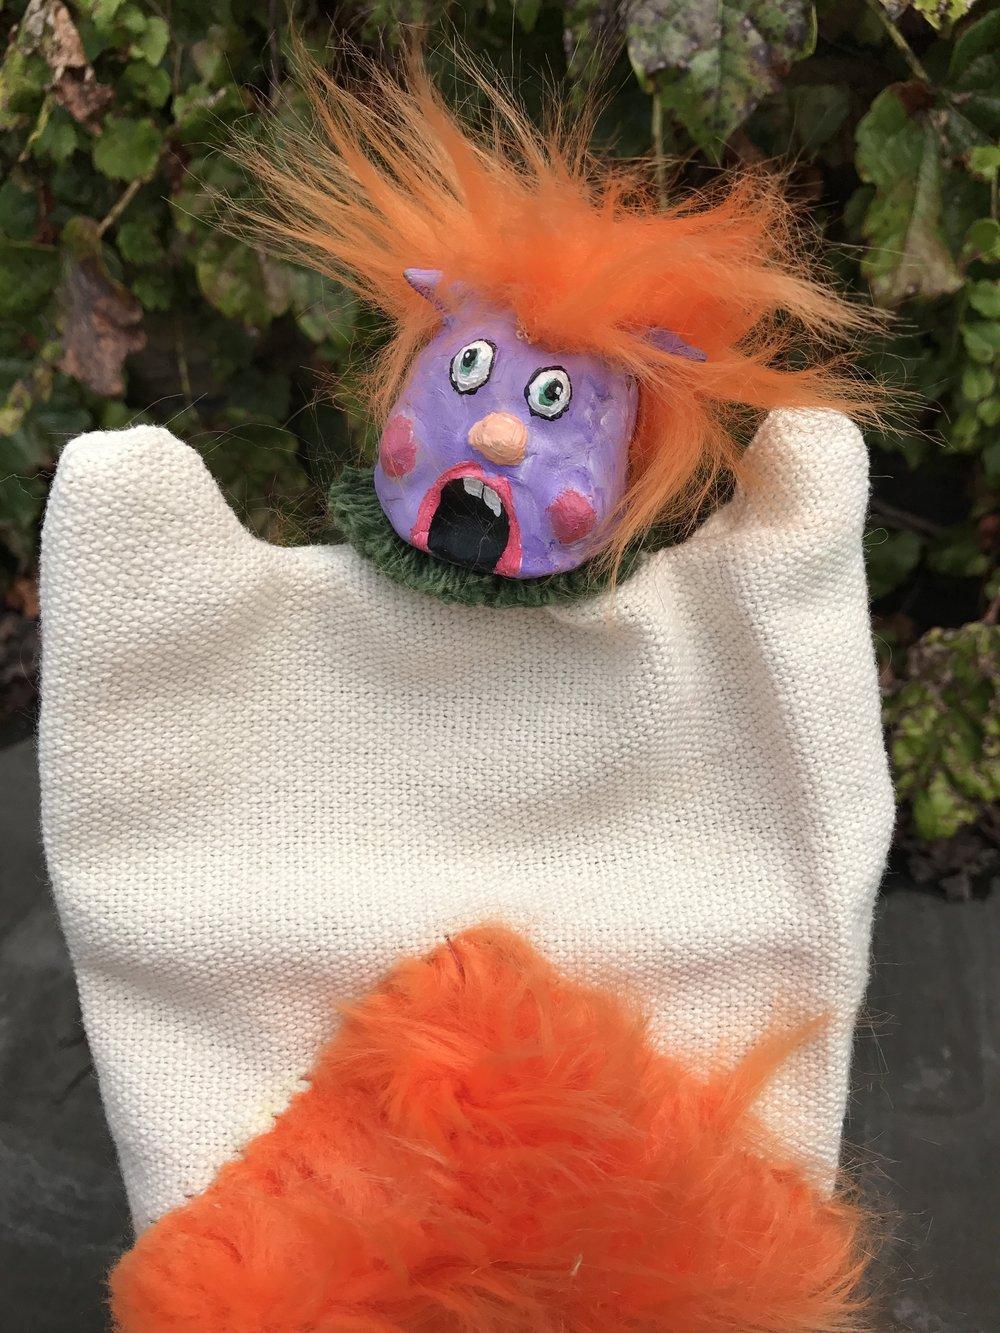 Chip, hand puppet